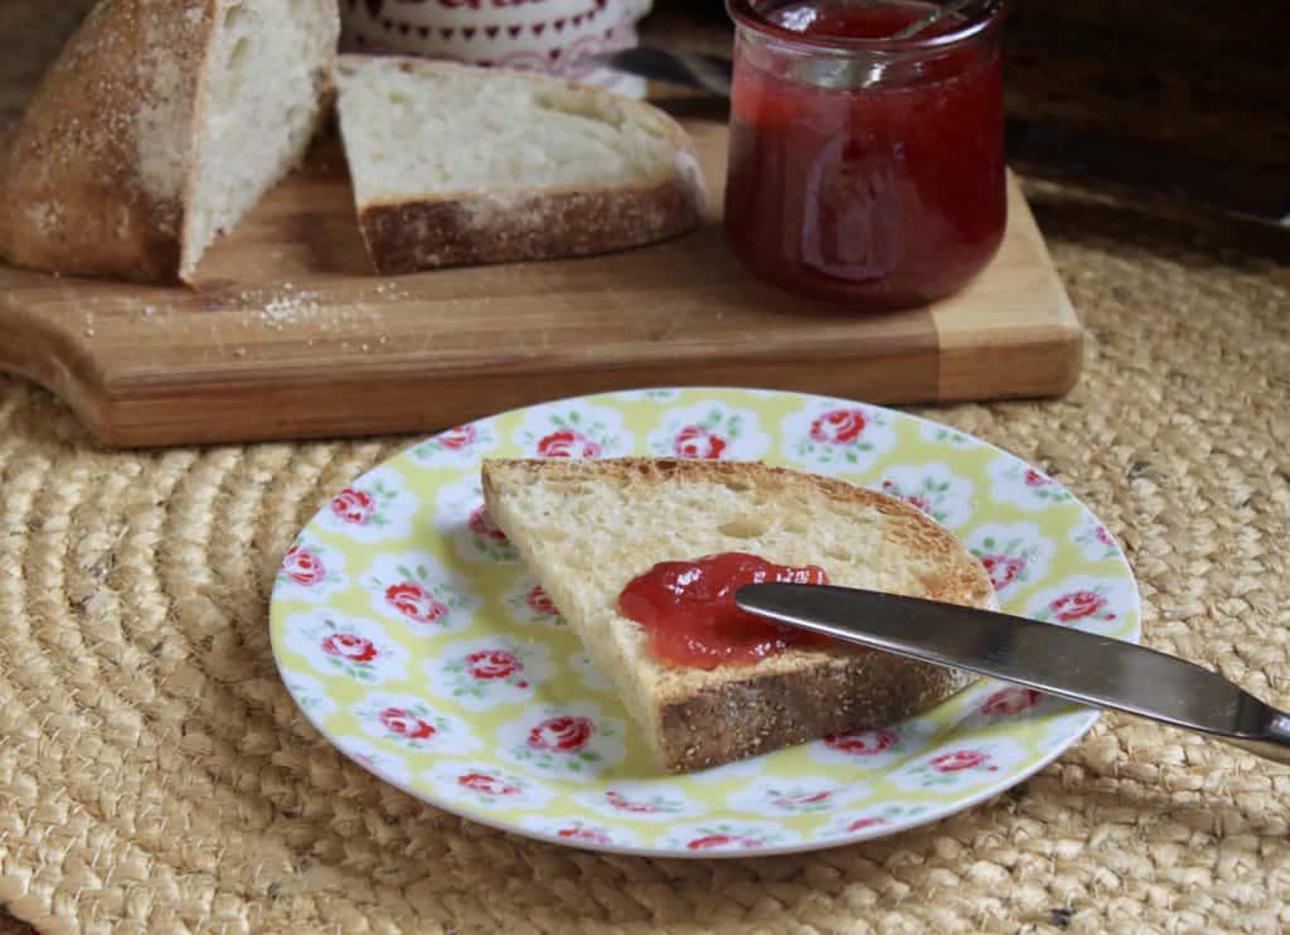 The Easiest Rhubarb Jam Recipe by Christina's Cucina // 15 Rhubarb Dessert Recipes for Spring